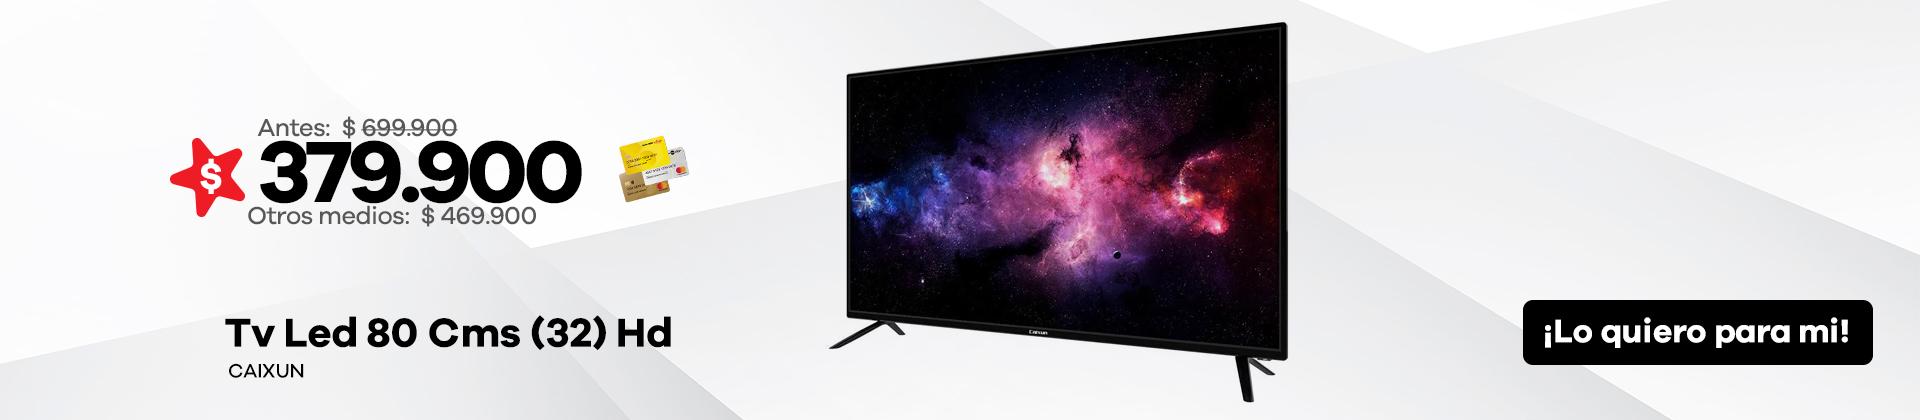 tv-led-80-caixun-basico